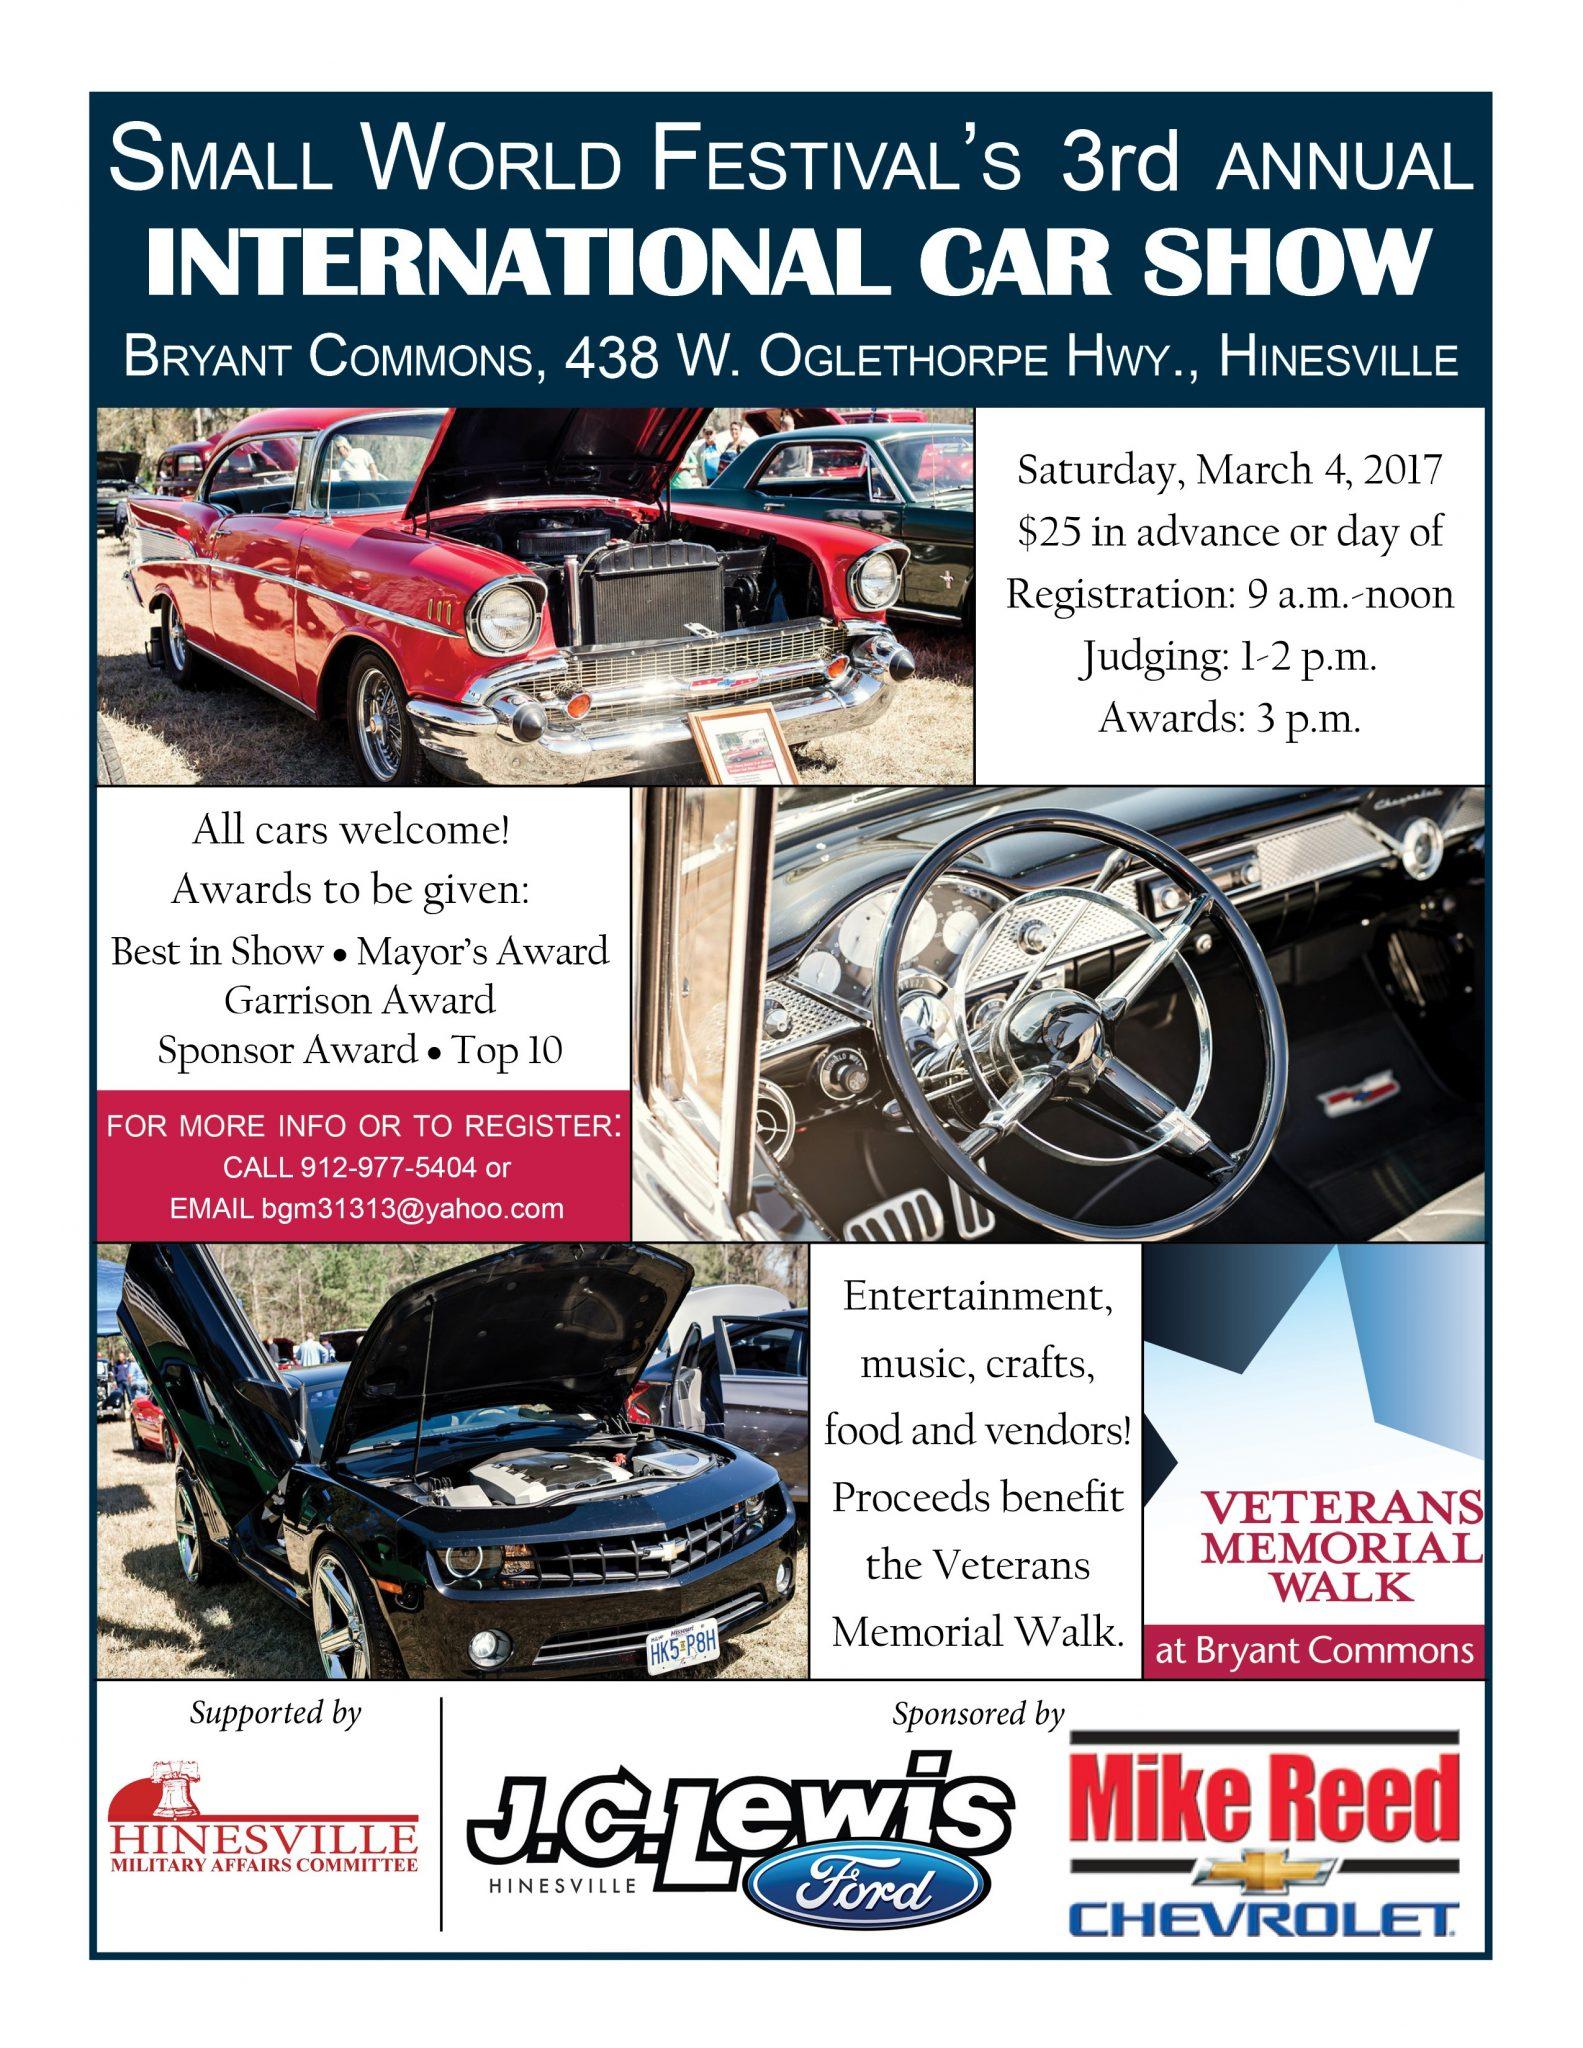 Rd Annual International Car Show At The Small World FestivalLiberty - Car show awards